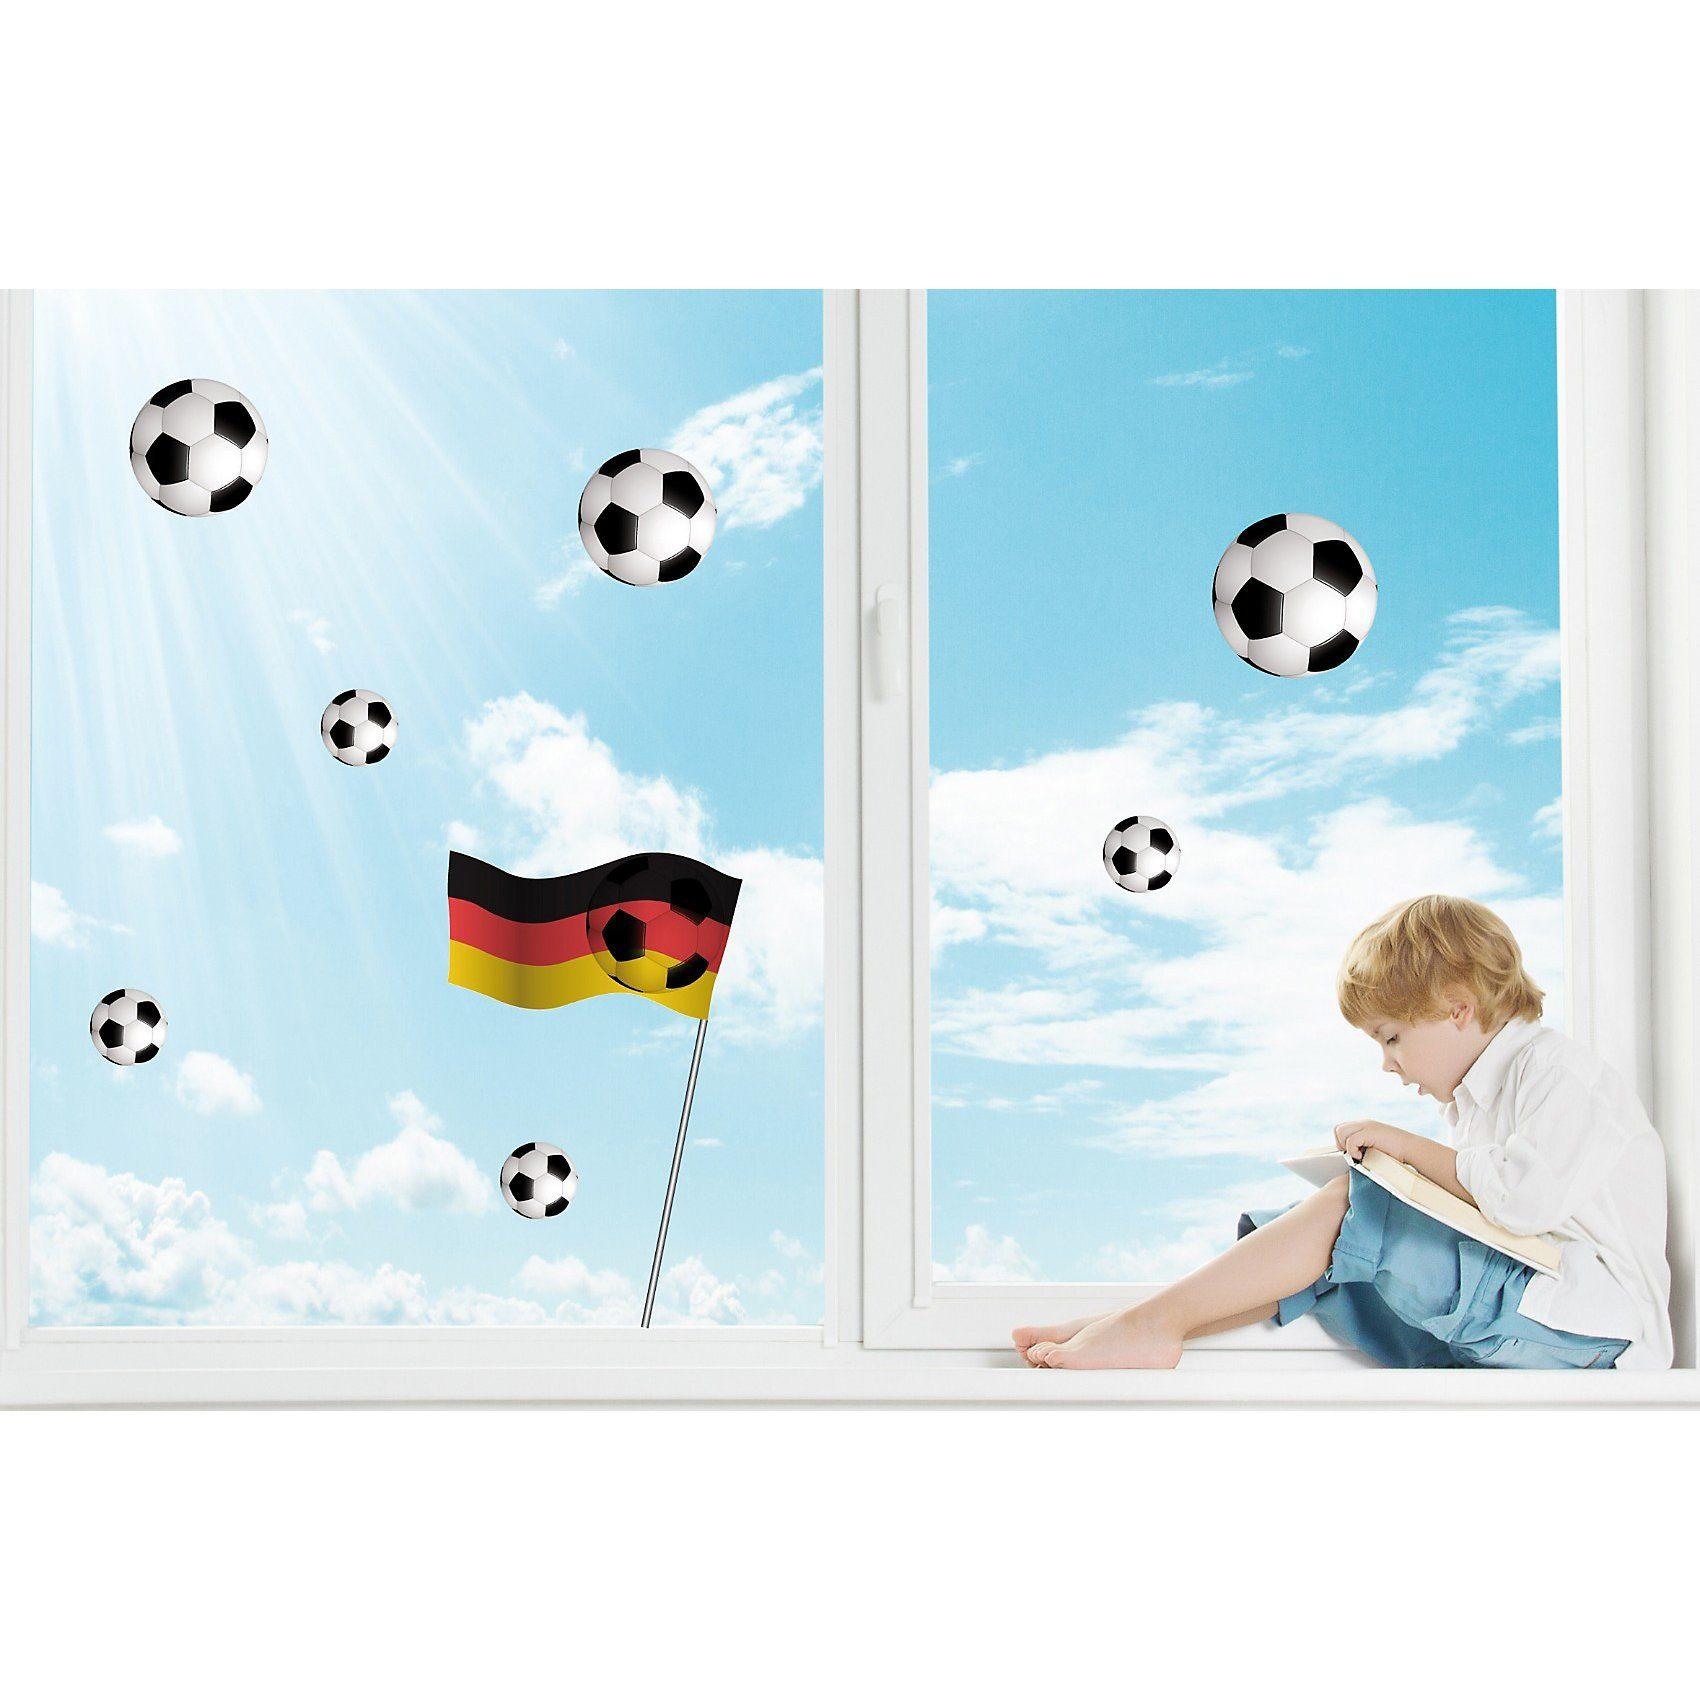 Fenster Sticker Fußball, 9-tlg.